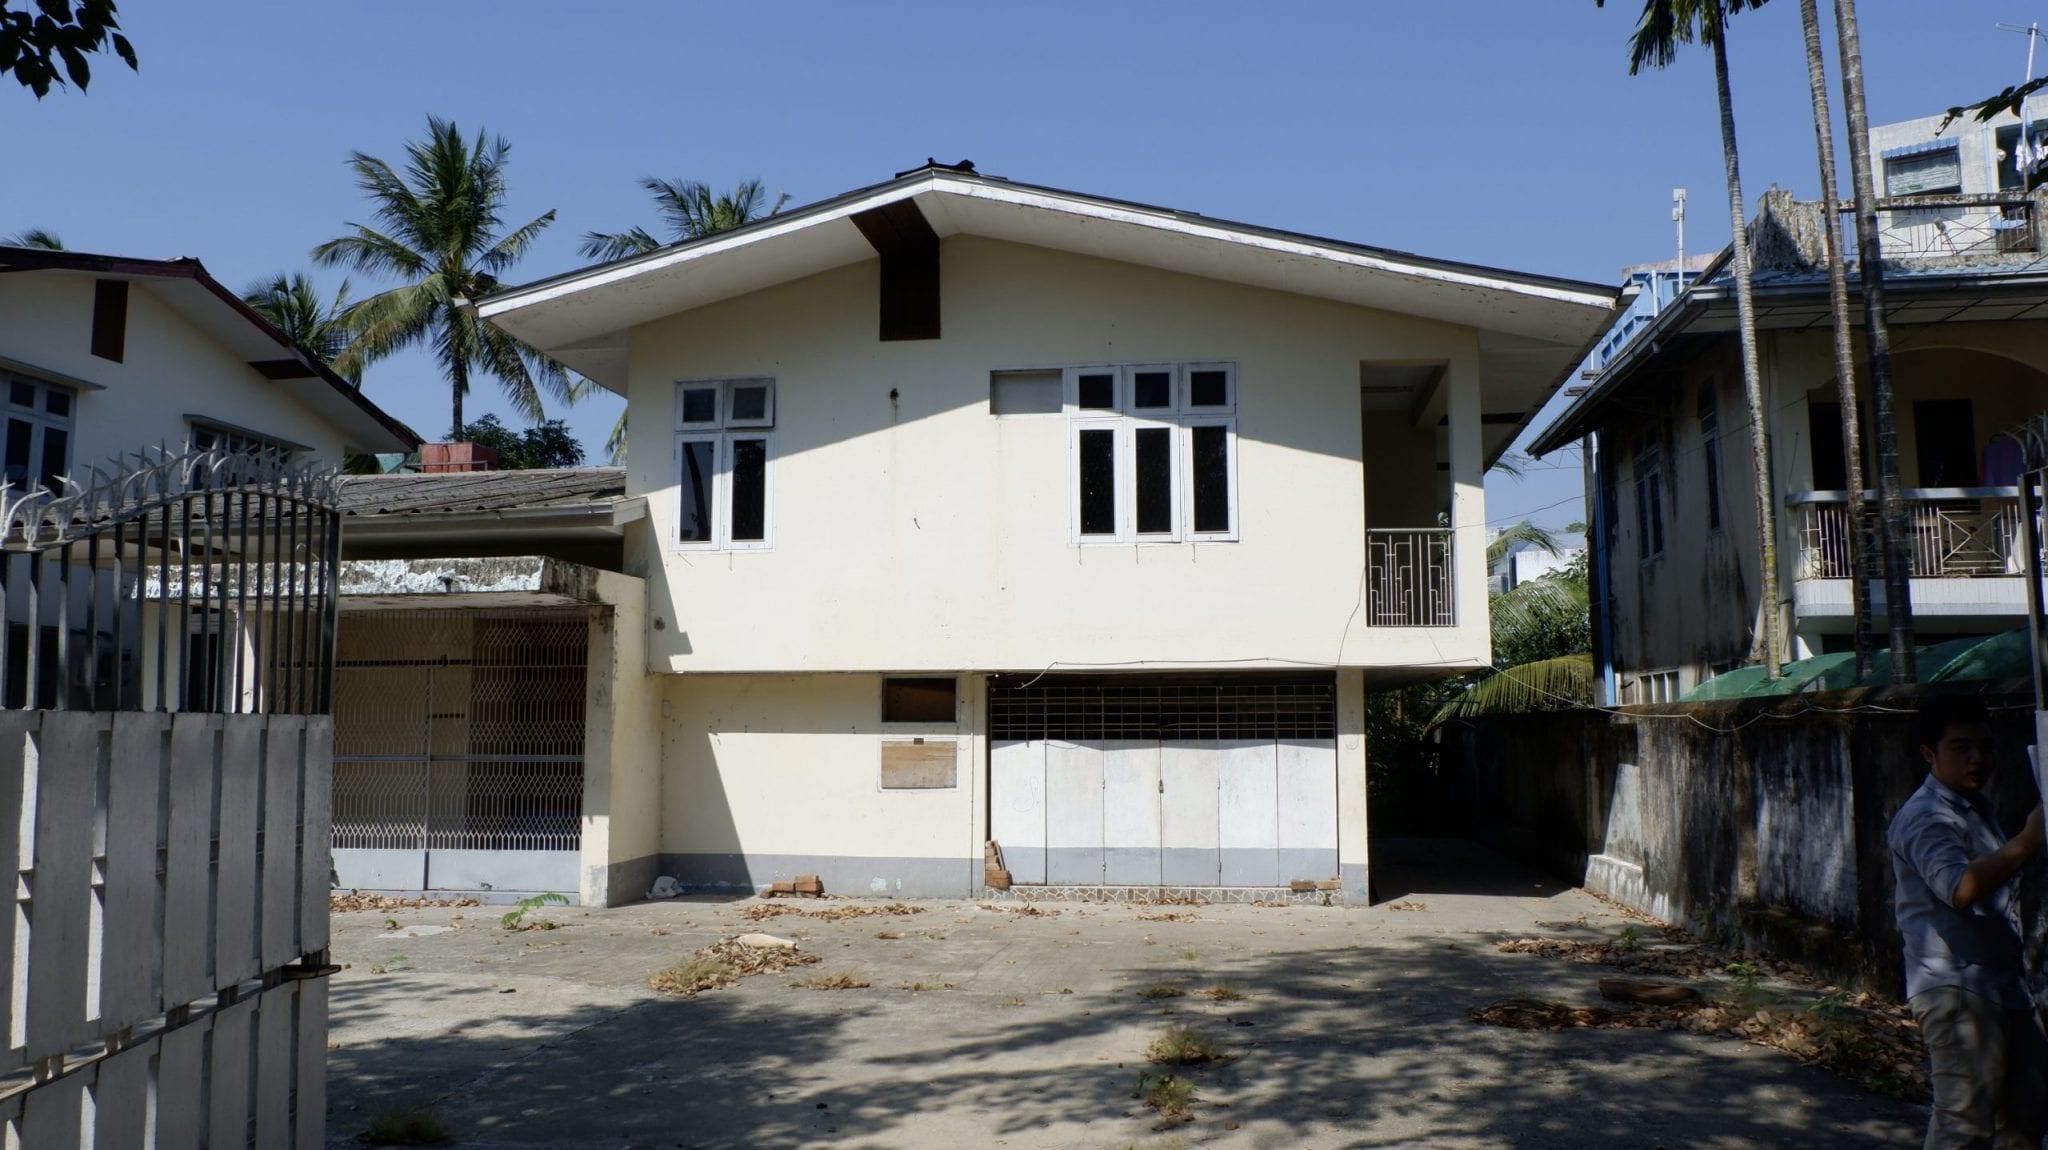 House in Thingangyun Township